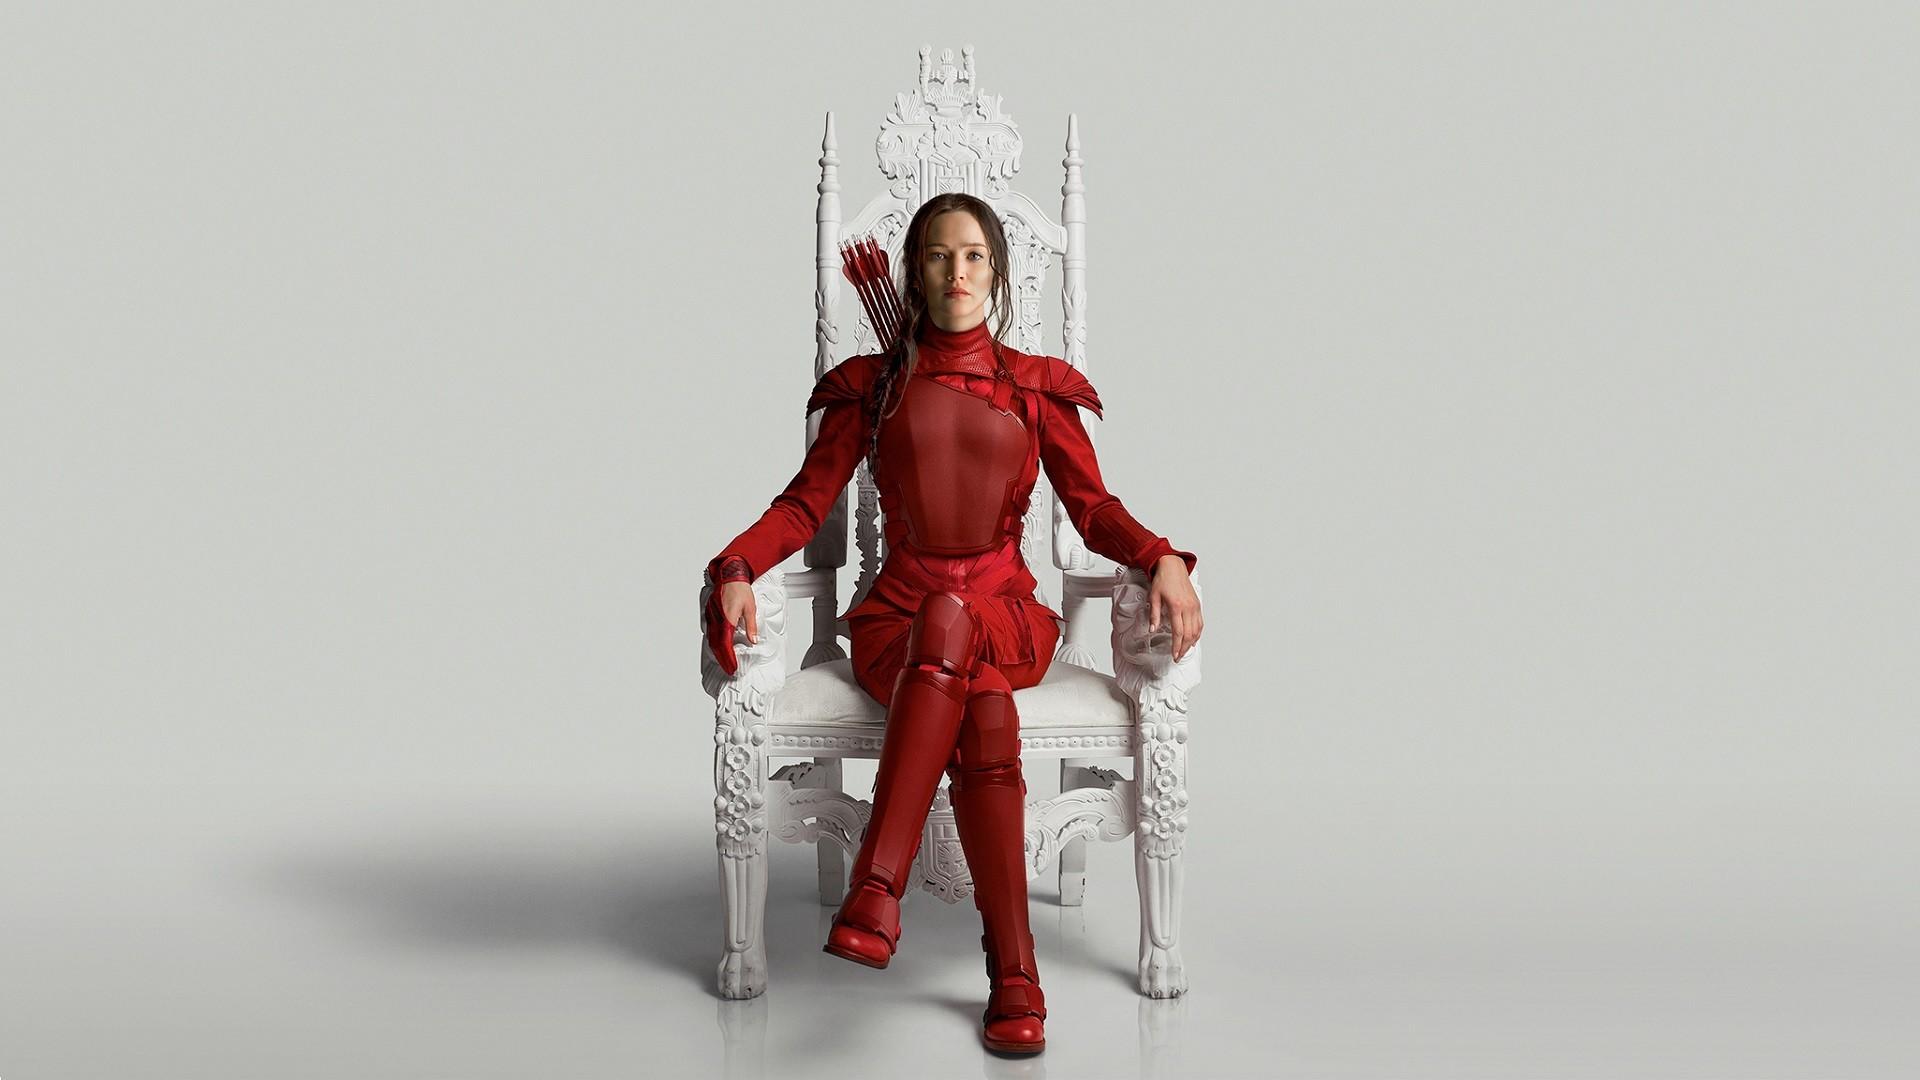 Jennifer Lawrence looking bad ass as Katniss [1920×1080] …